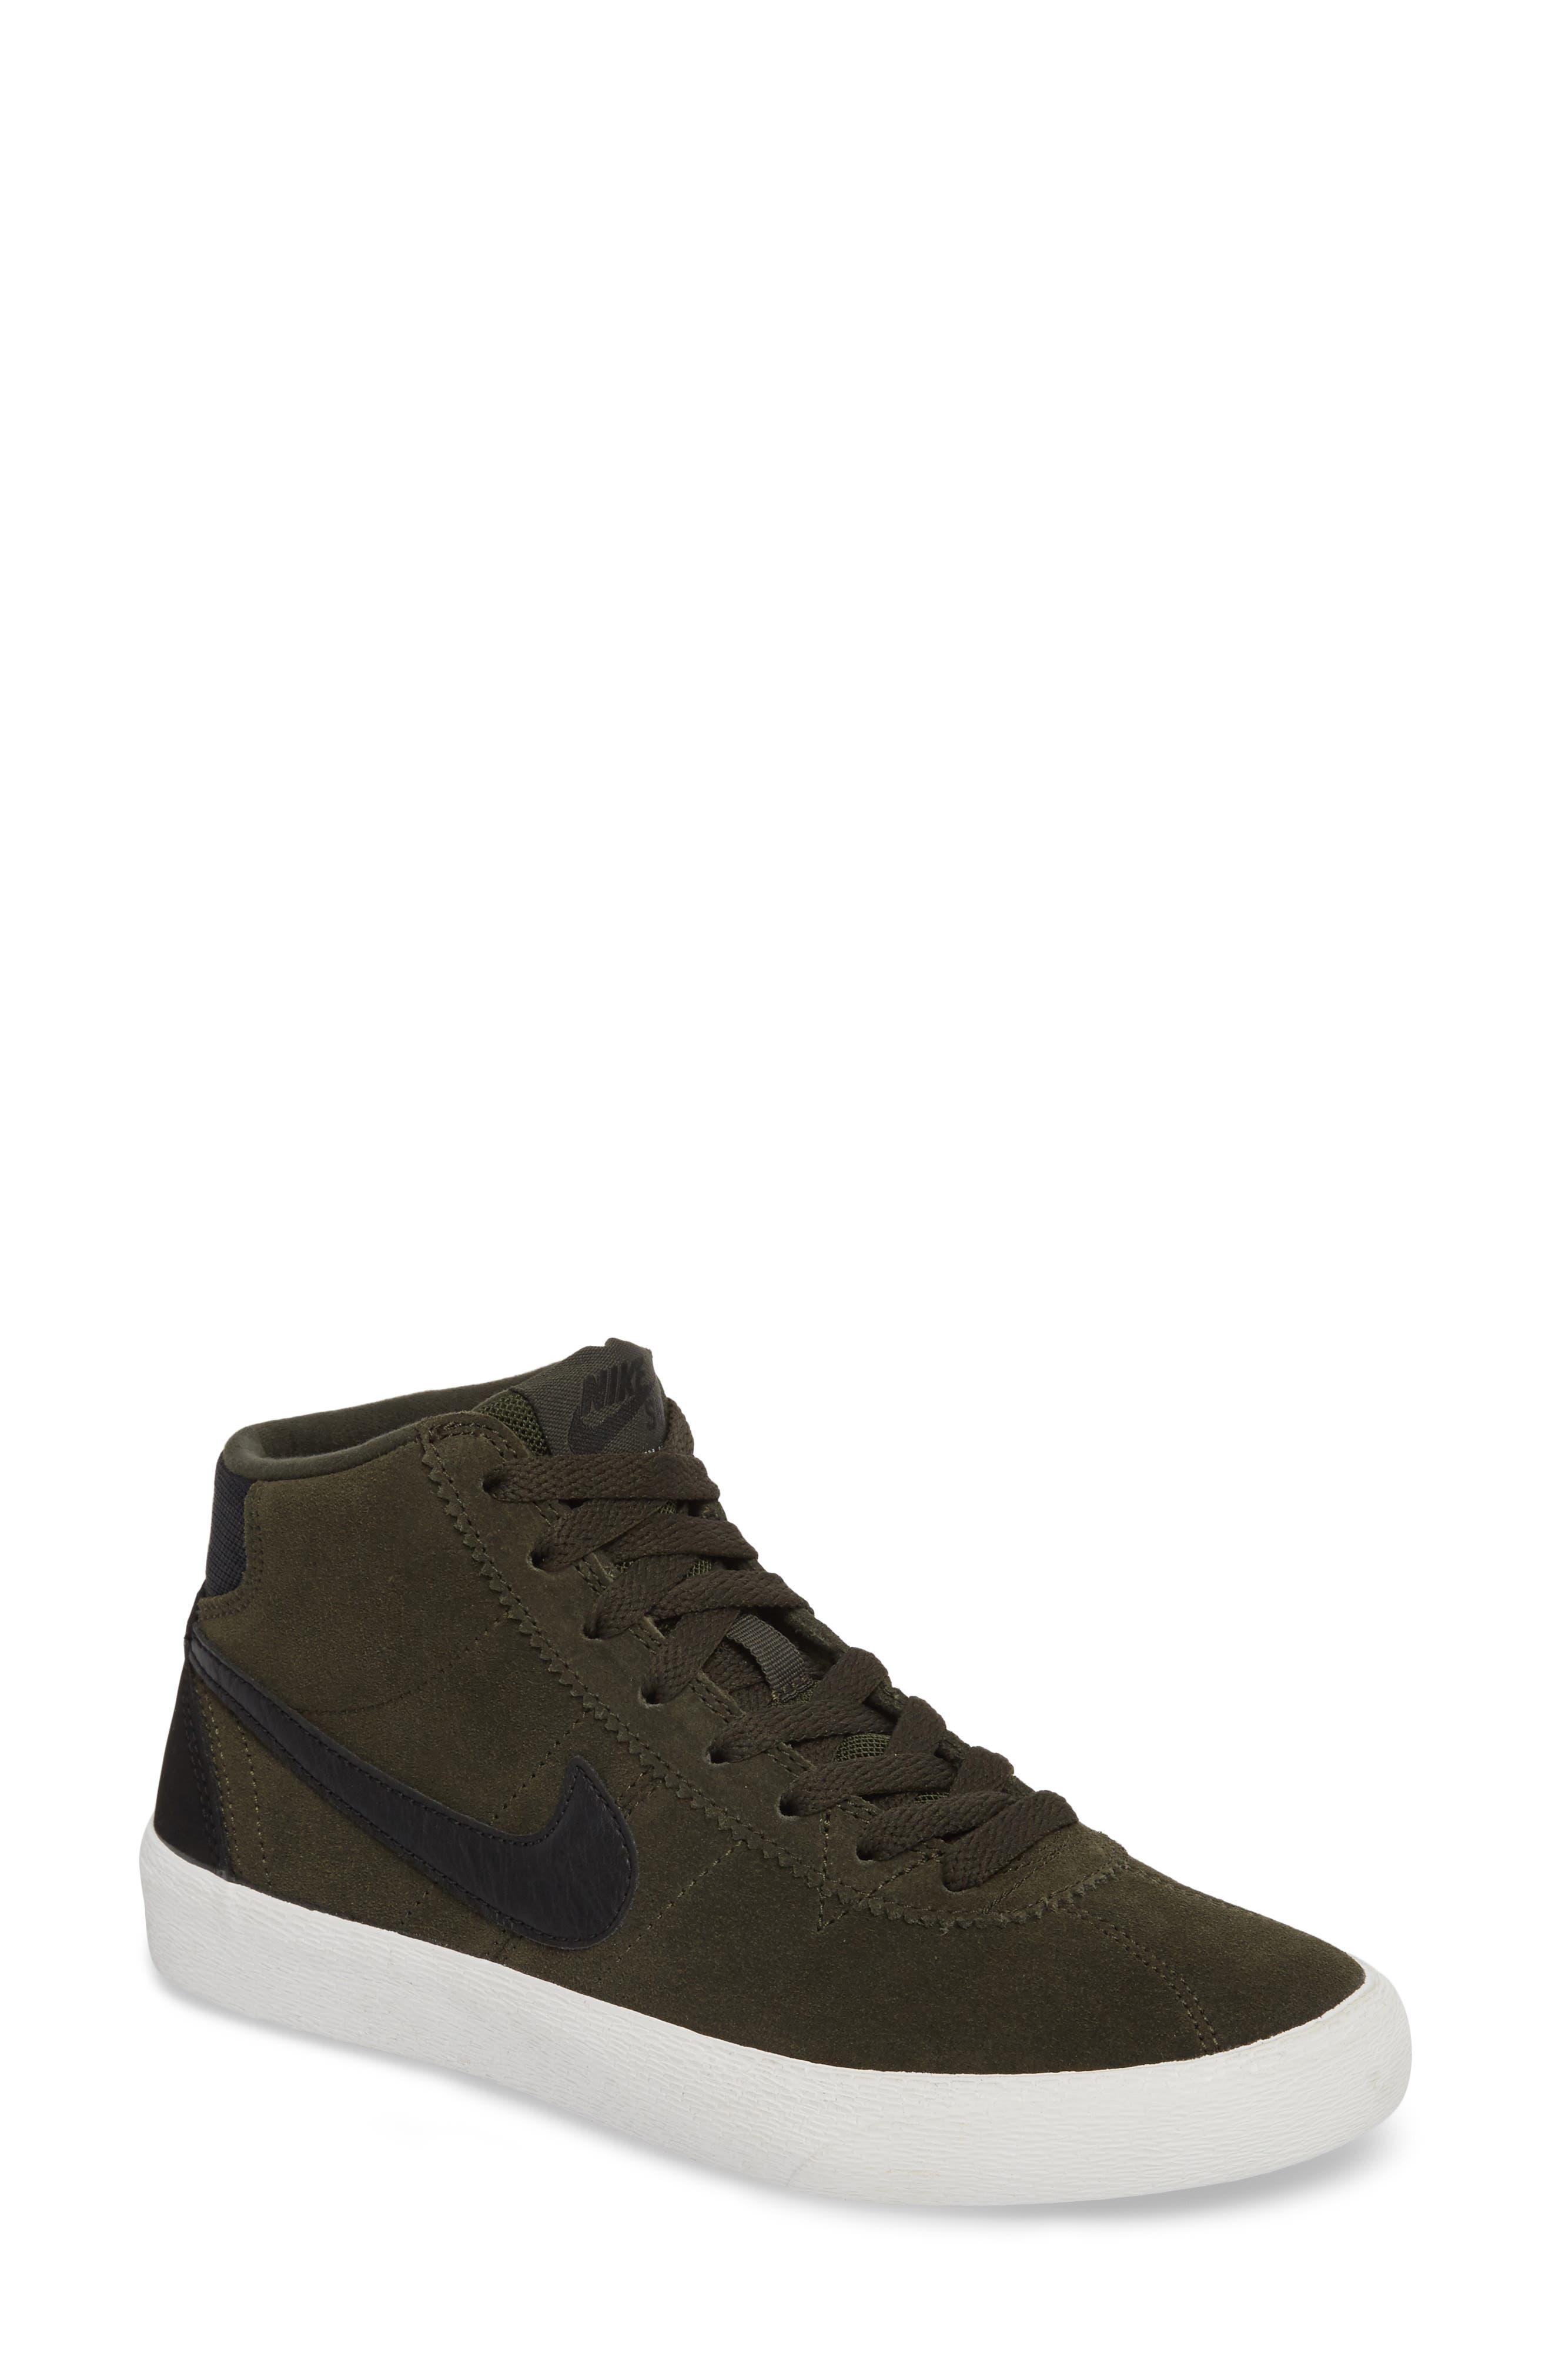 Main Image - Nike SB Bruin Hi Skateboarding Sneaker (Women)